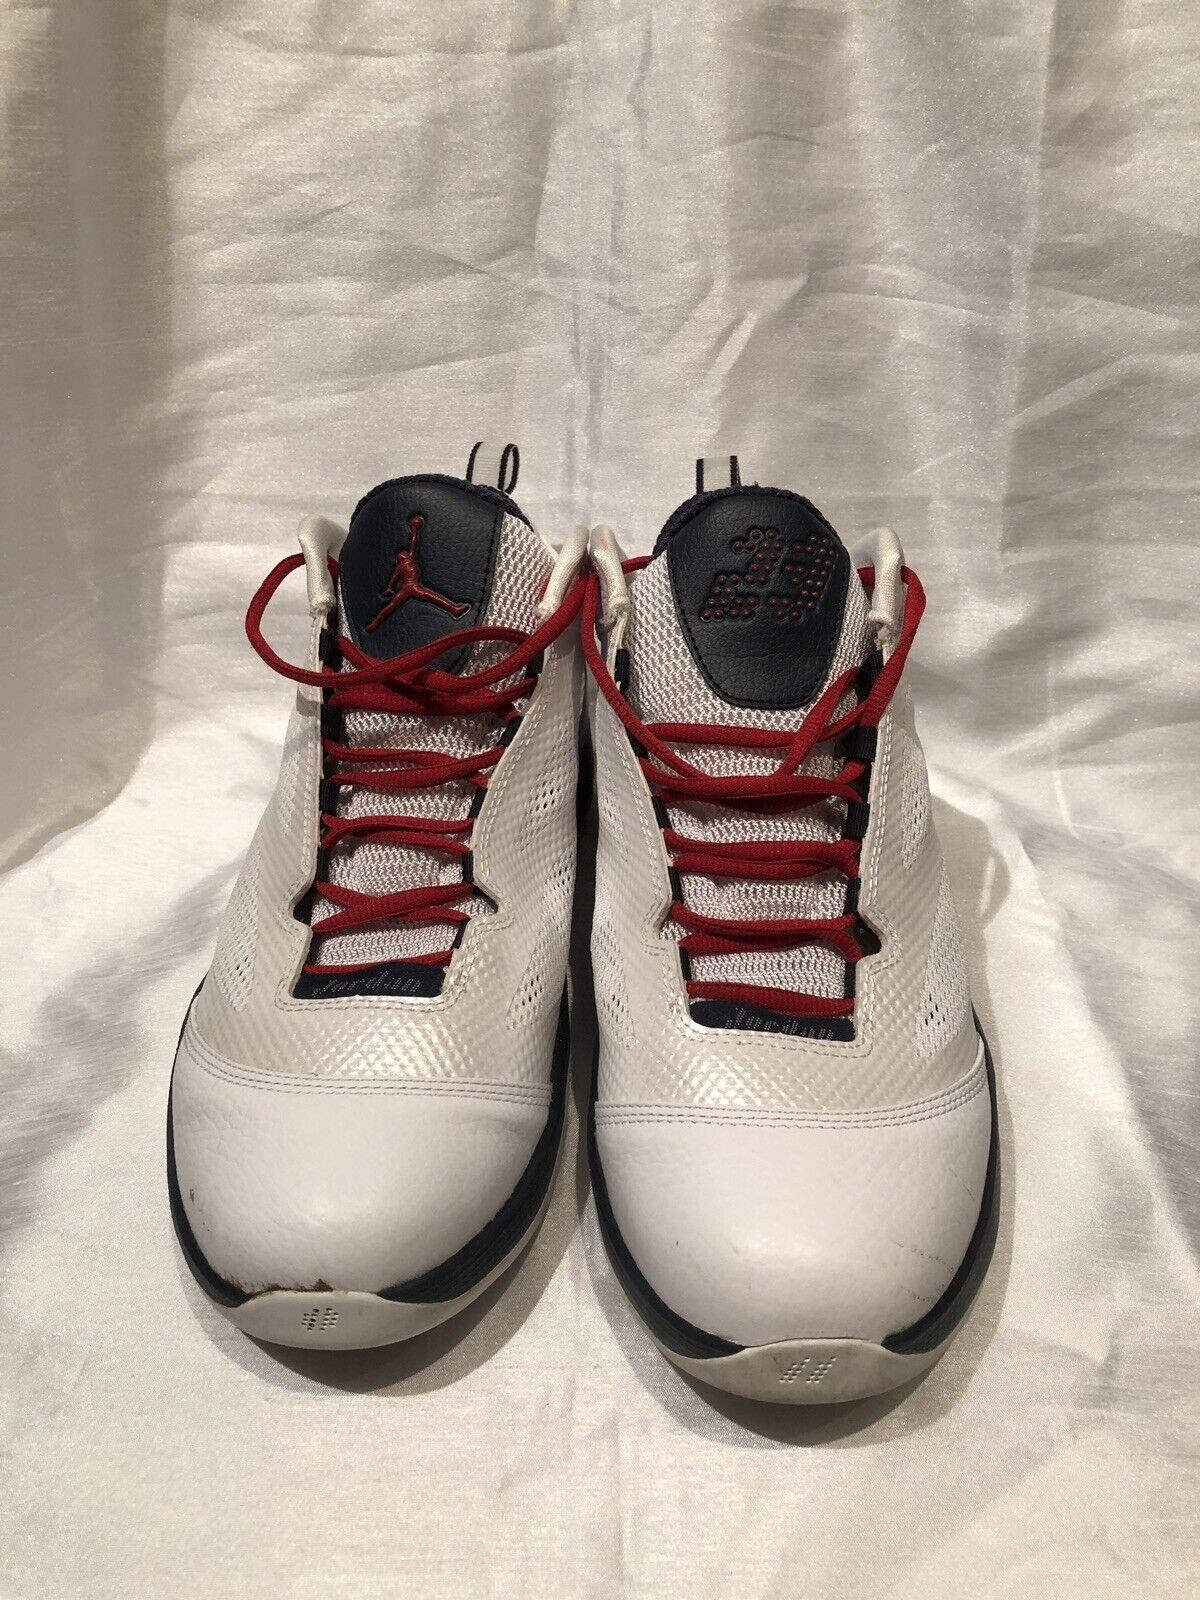 New Nike Jordan 454486 102 Q Flight White Men's Basketball shoes Size 10.5 US